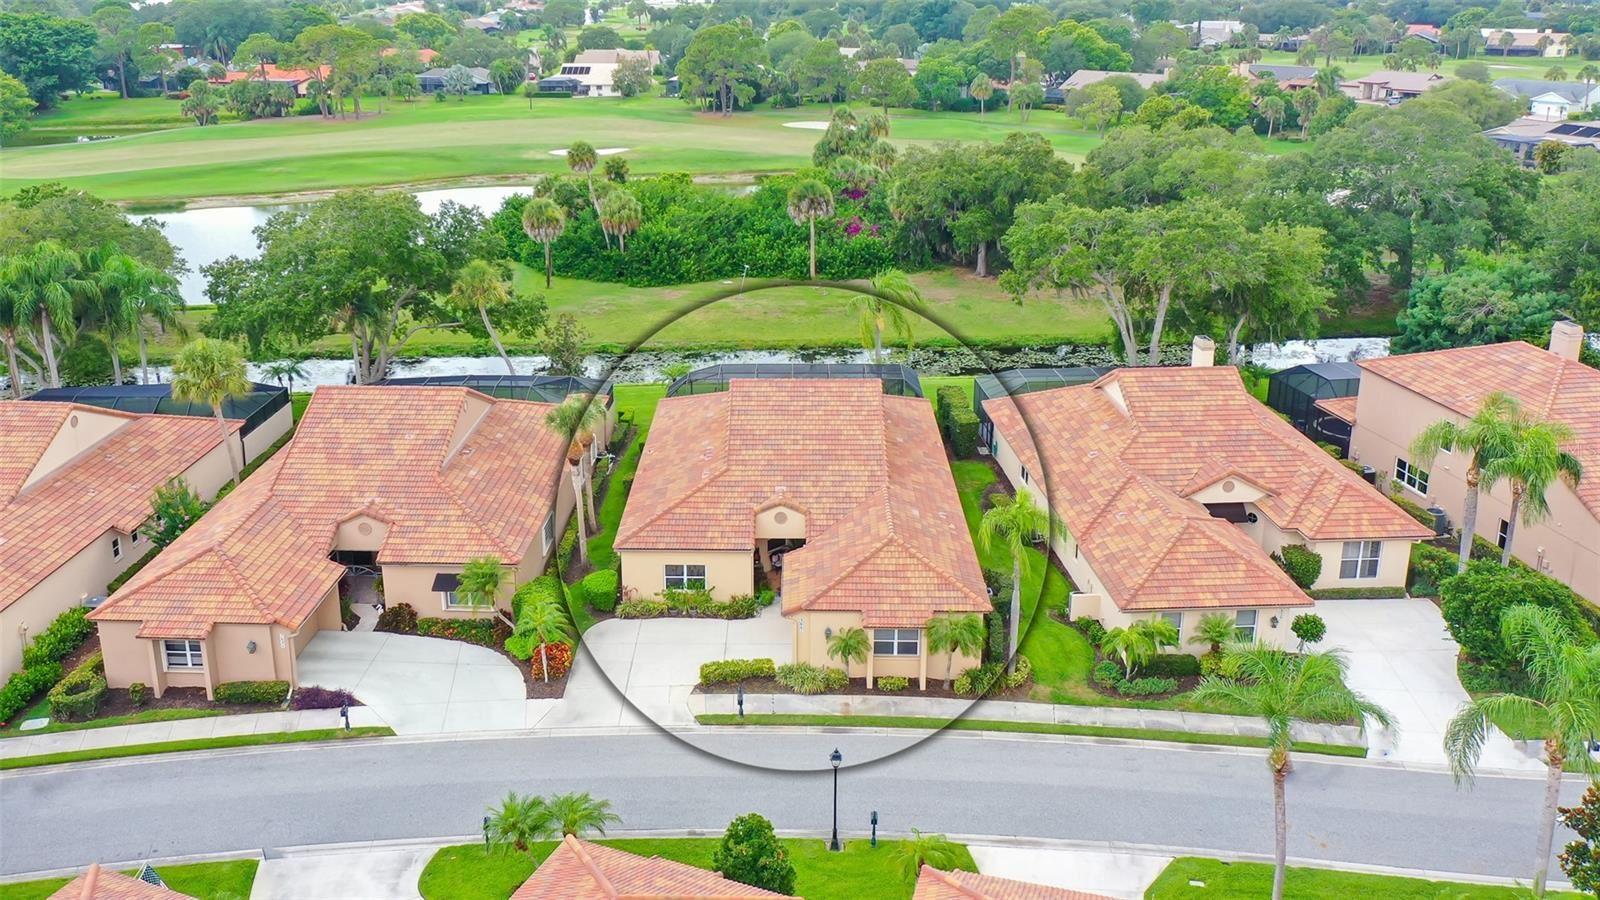 7662 CALLE FACIL, Sarasota, FL 34238 - #: A4504047